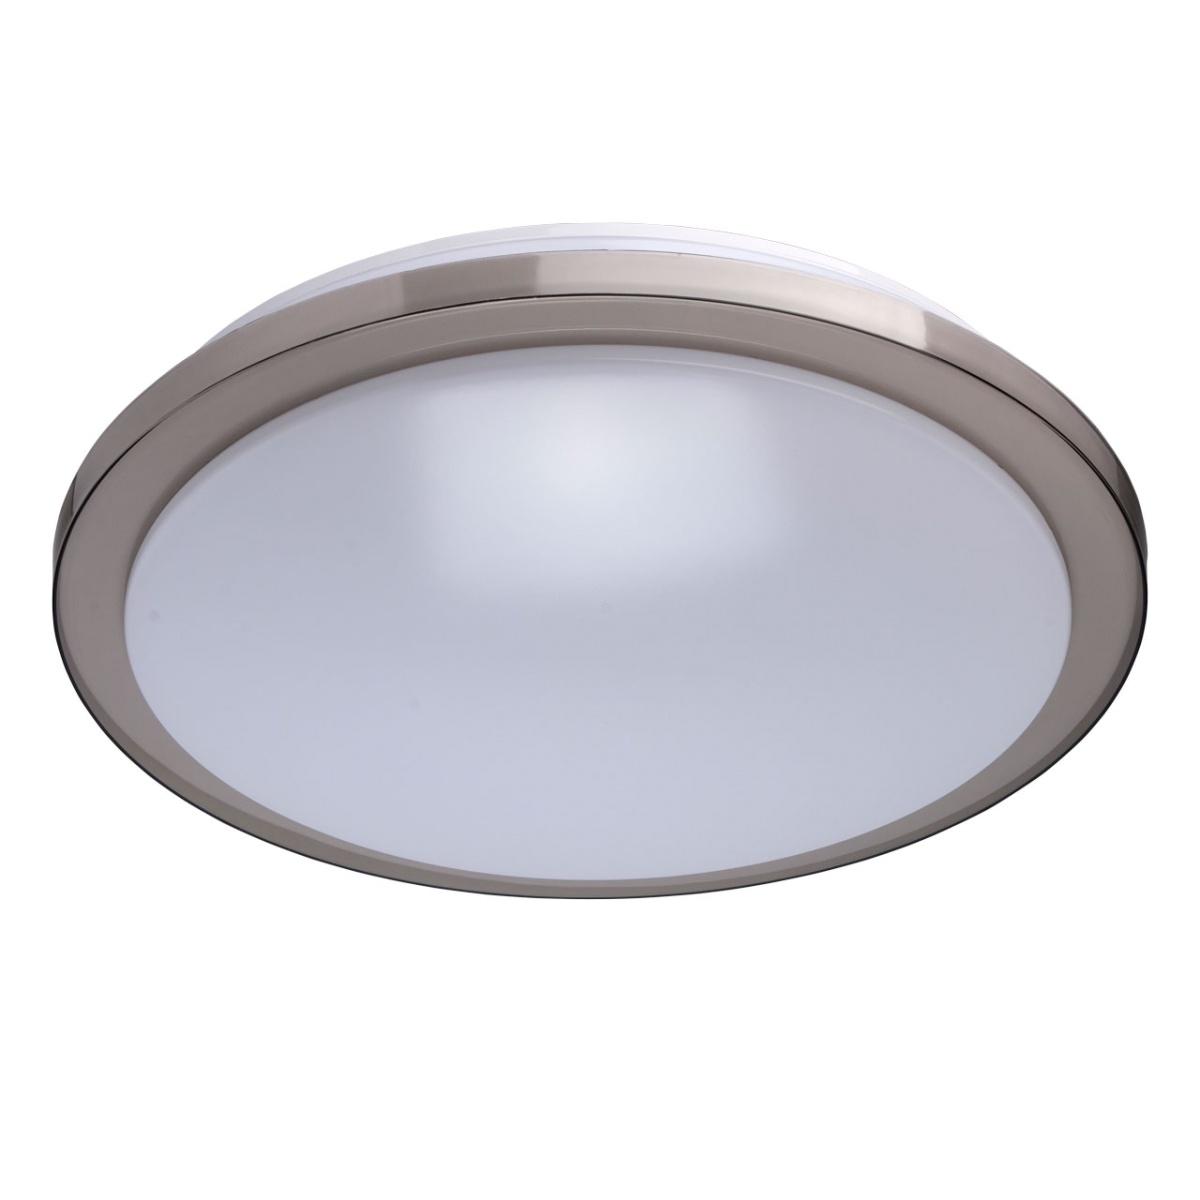 Plafoniera MW-Light Techno 674012601 title=Plafoniera MW-Light Techno 674012601